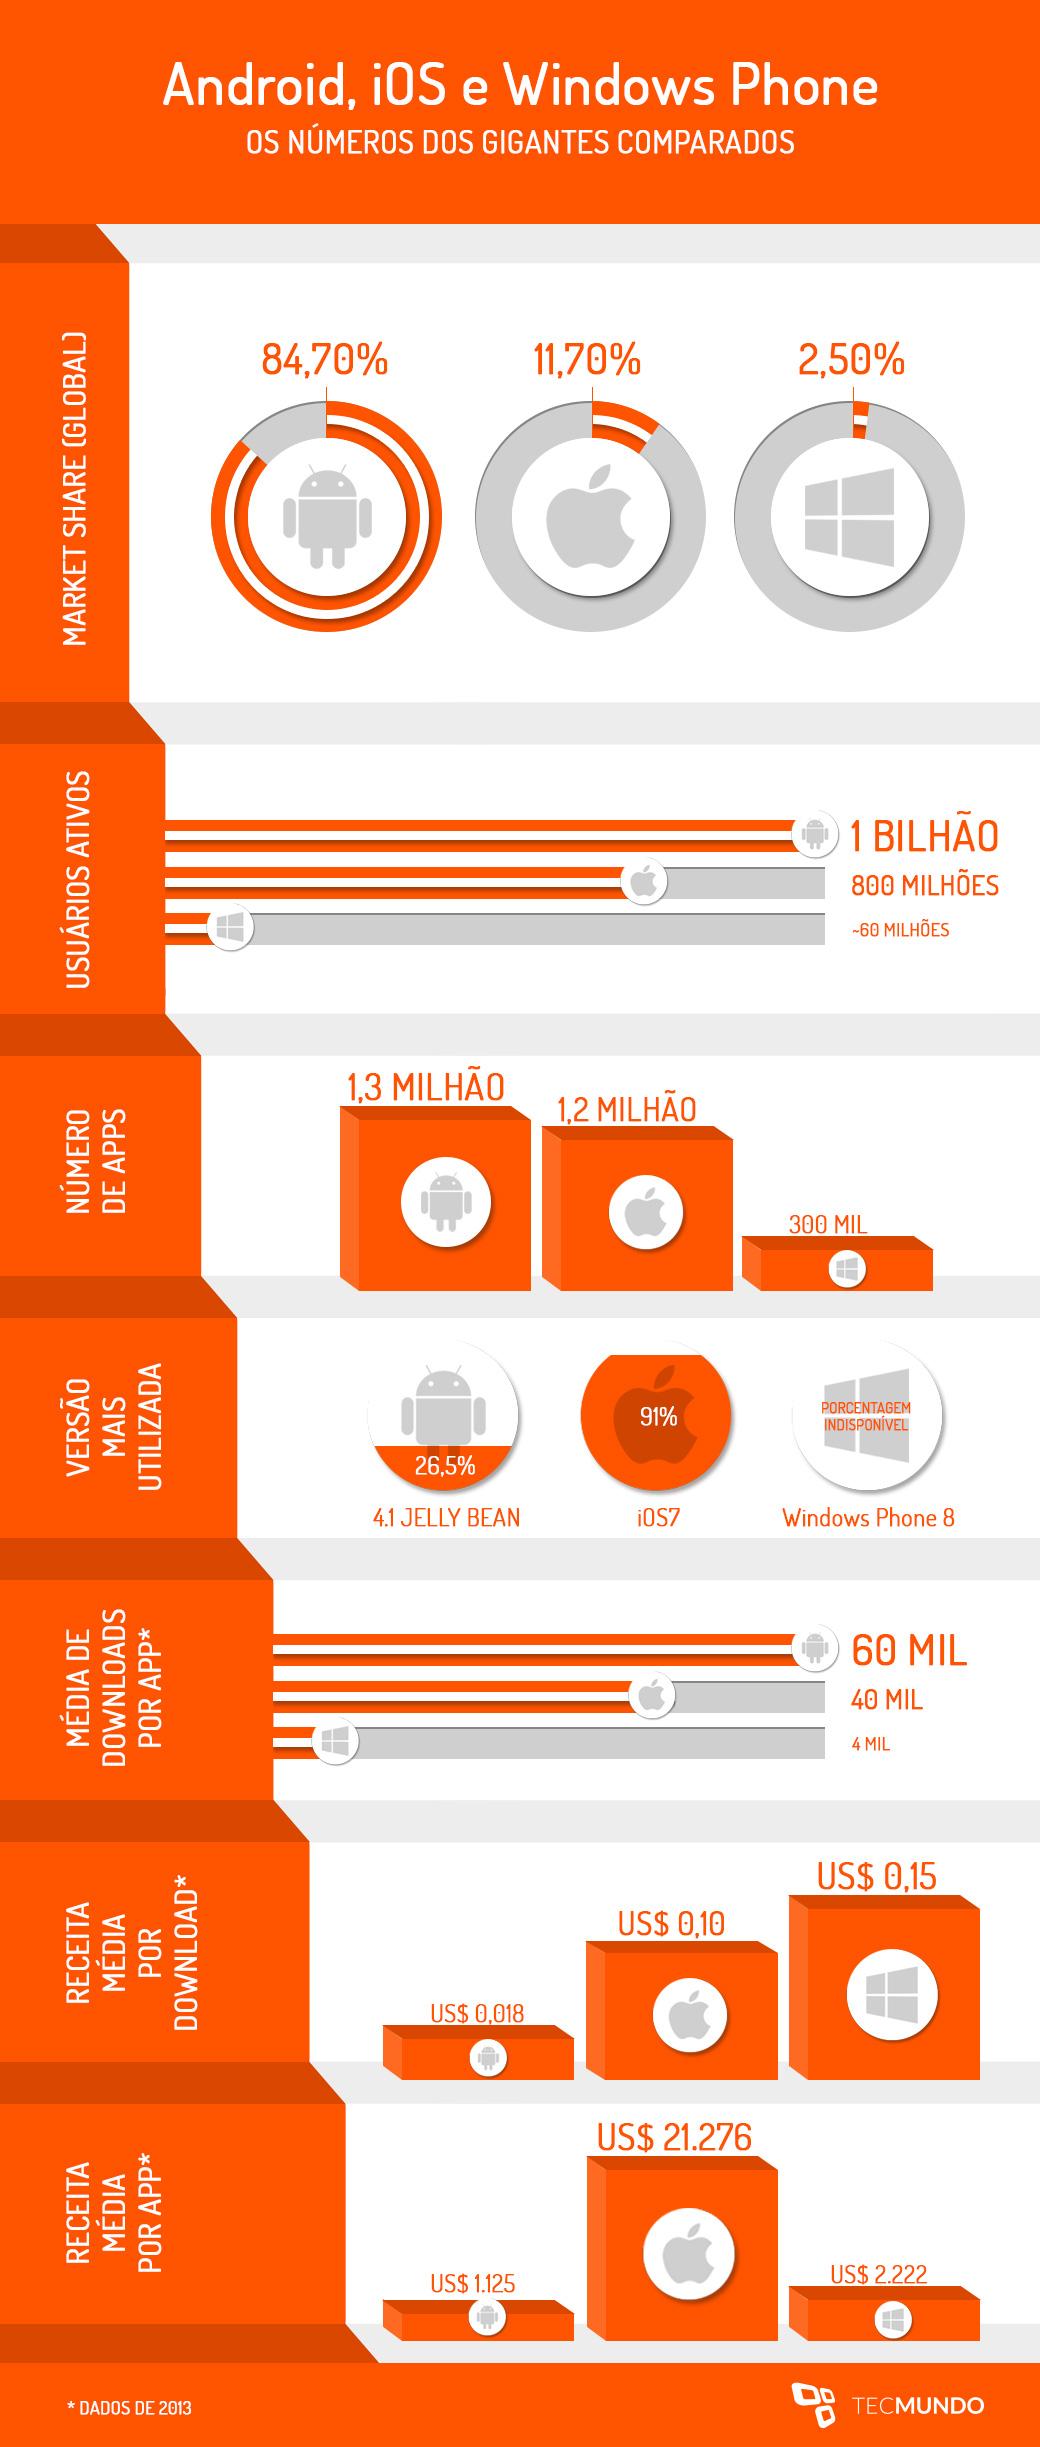 iOS, Android e Windows Phone: números dos gigantes comparados [infográfico]